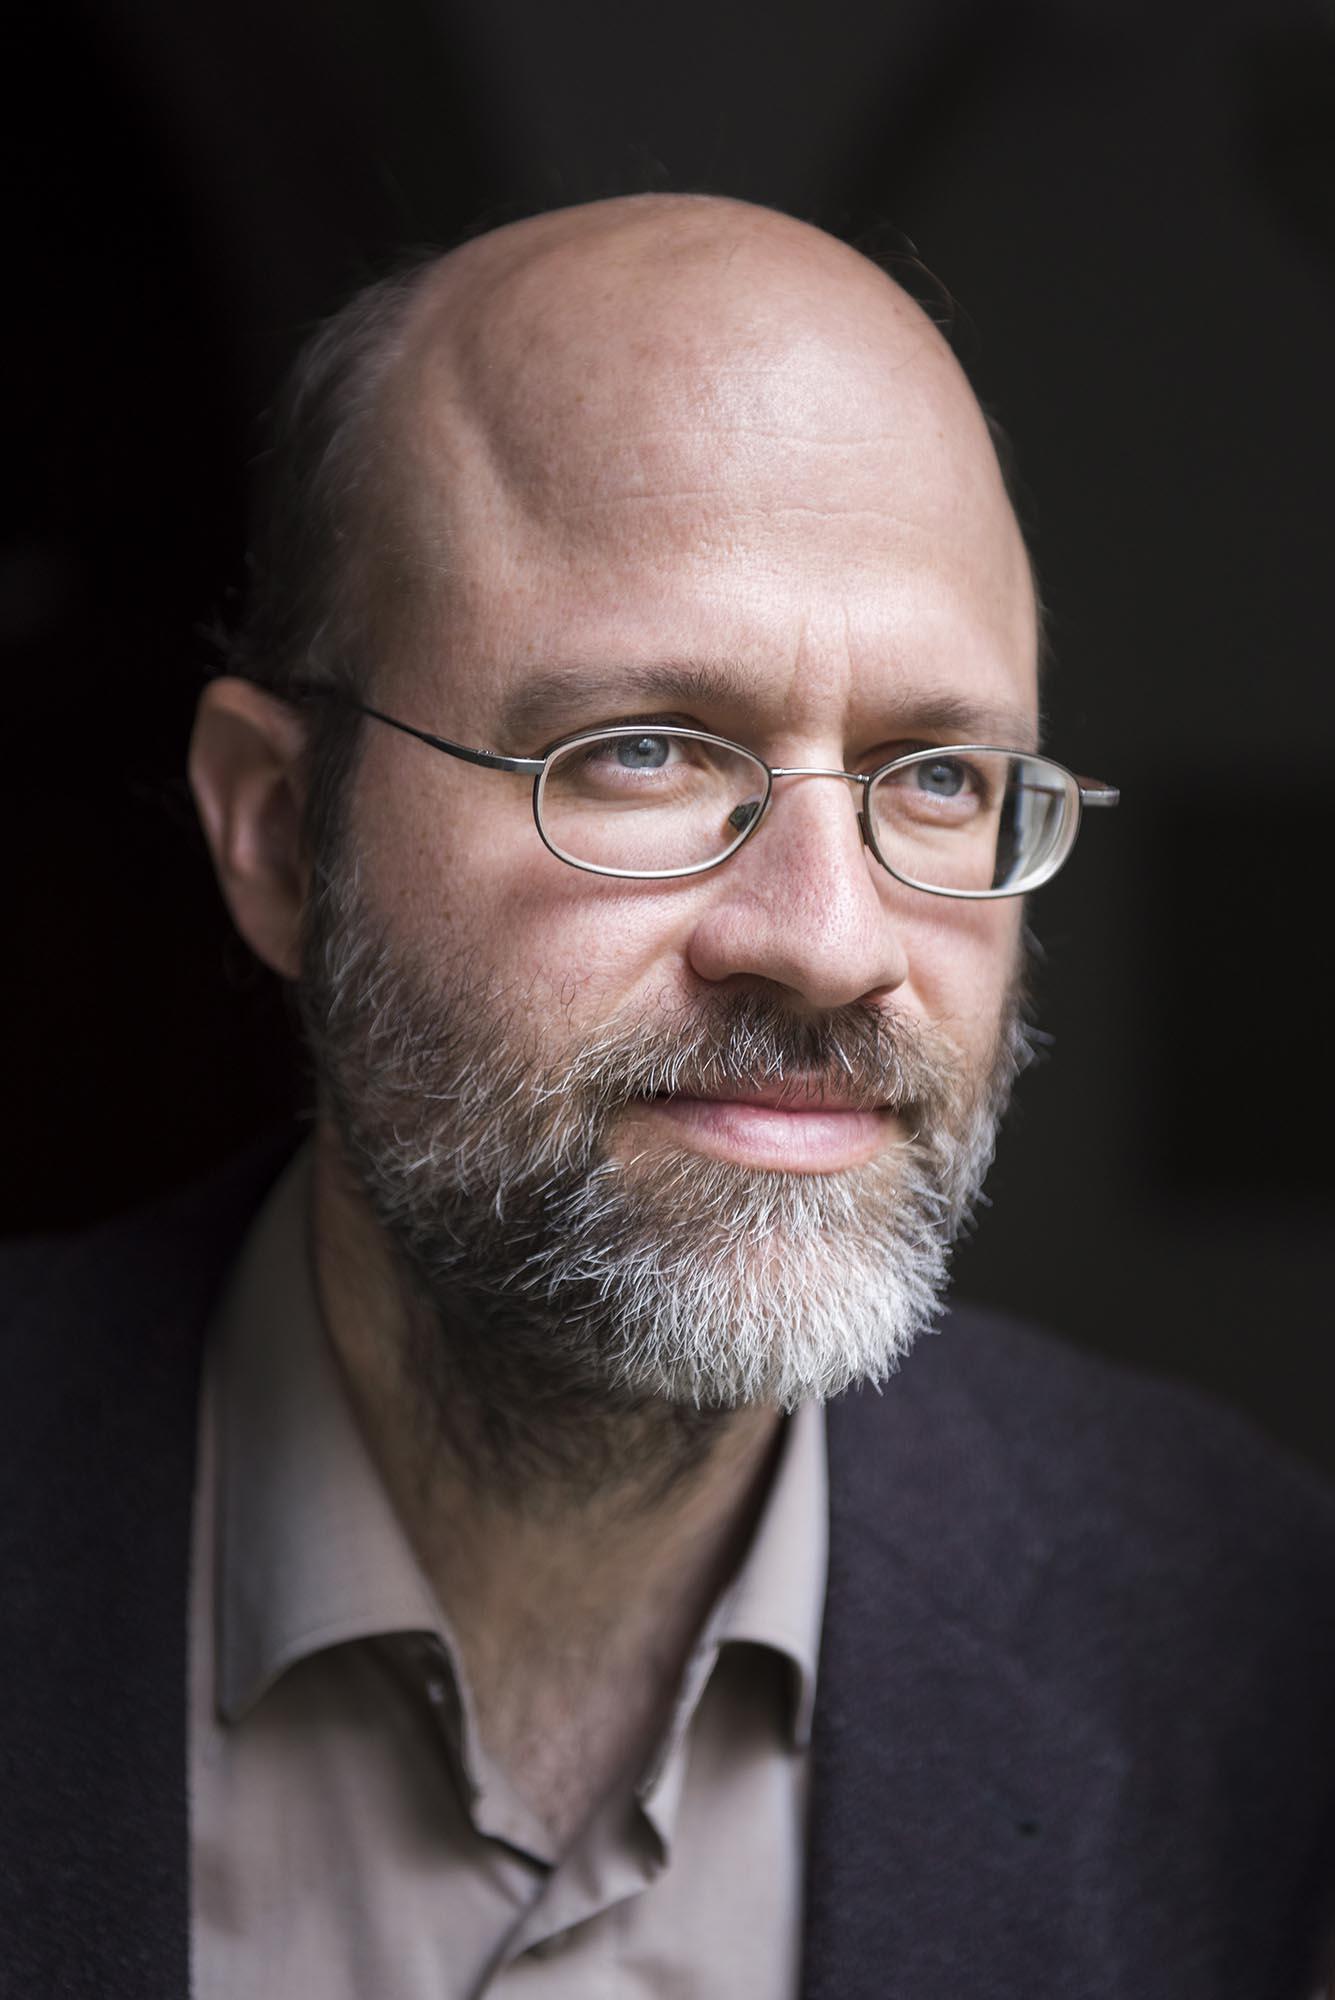 Simon Peng-Keller